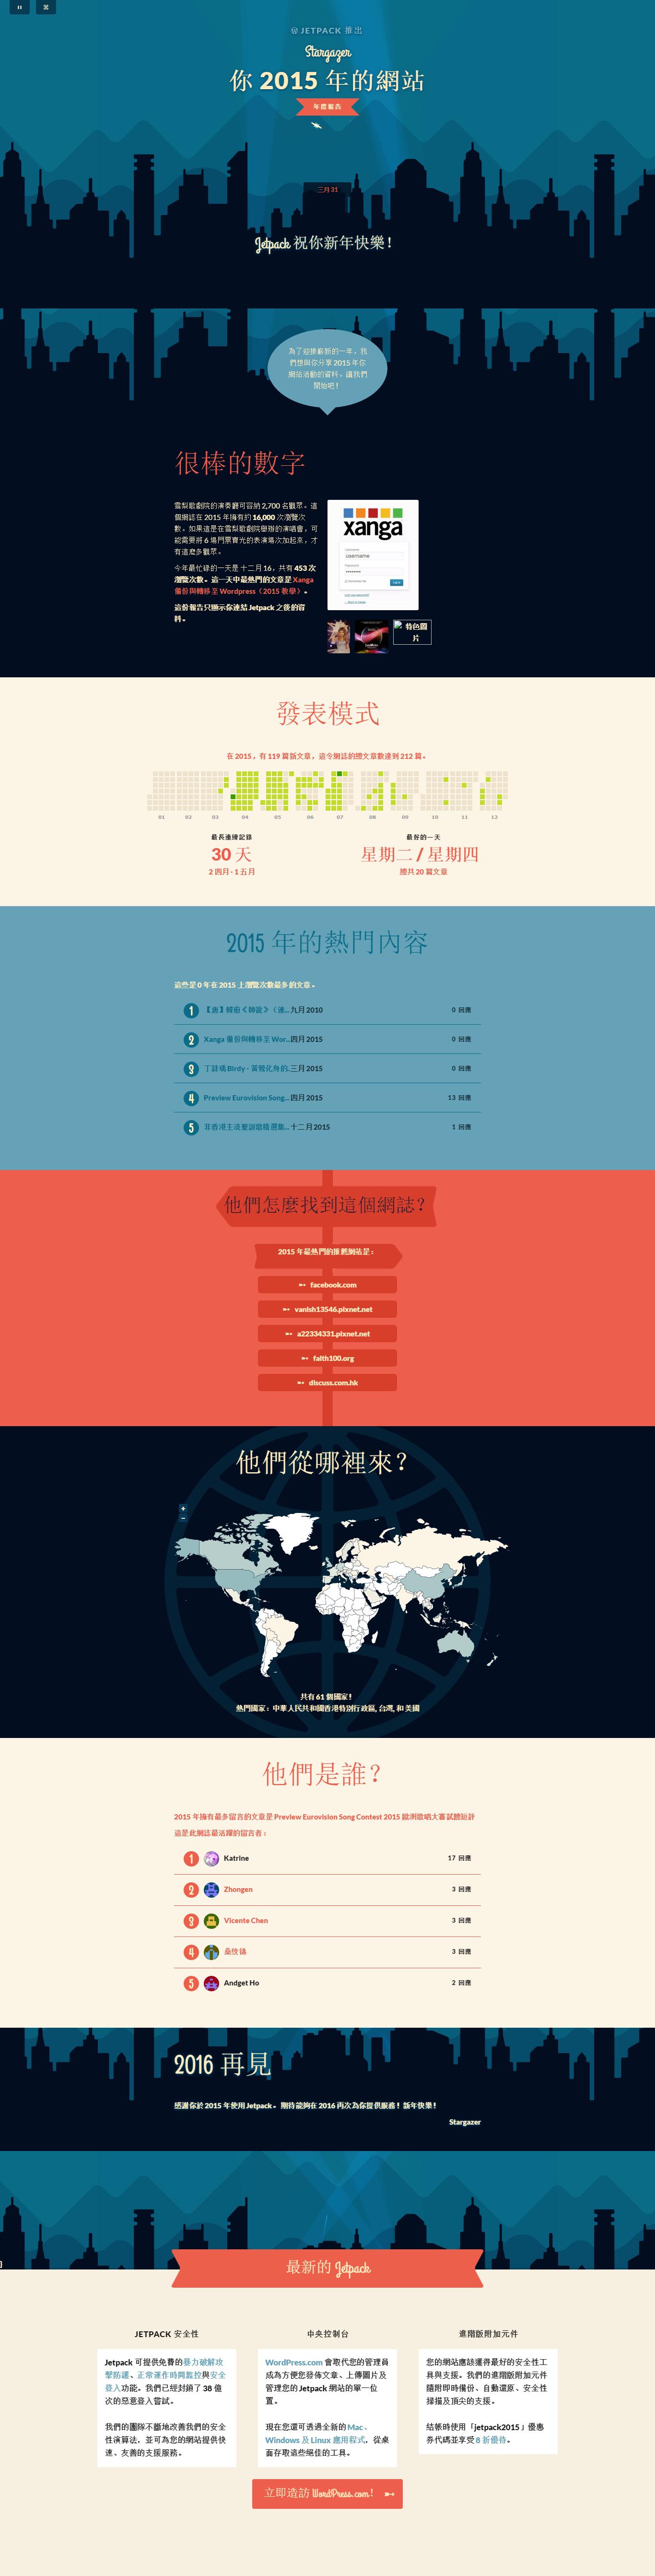 Stargazer 2015 年度報告